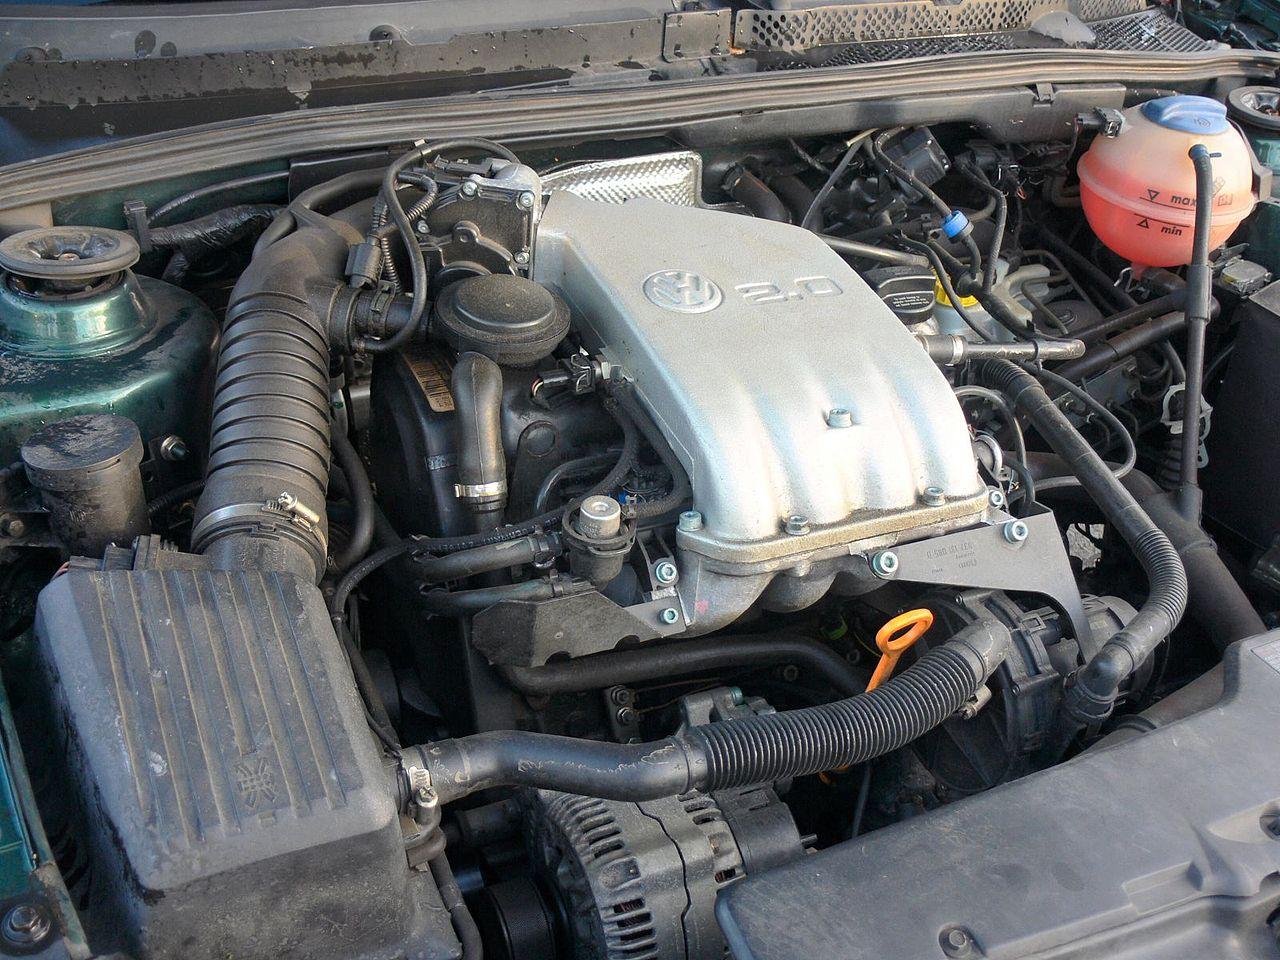 hight resolution of file volkswagen 2 0 engine jpg wikimedia commons 2002 vw cabrio engine diagram 2000 vw cabrio